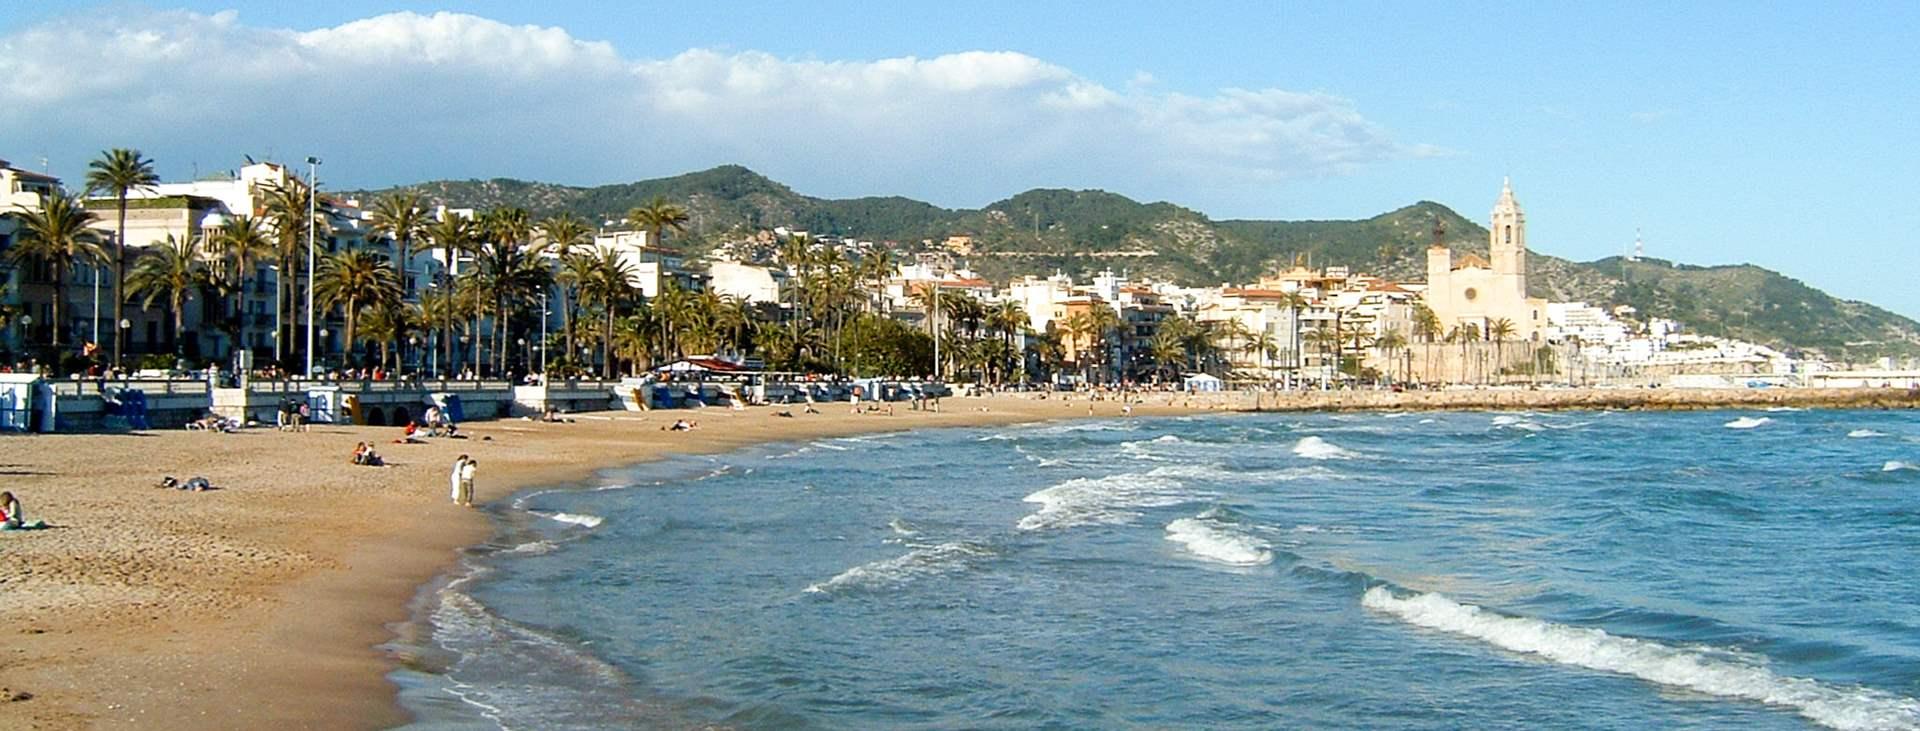 Reiser til Sitges på Costa Dorada i Spania